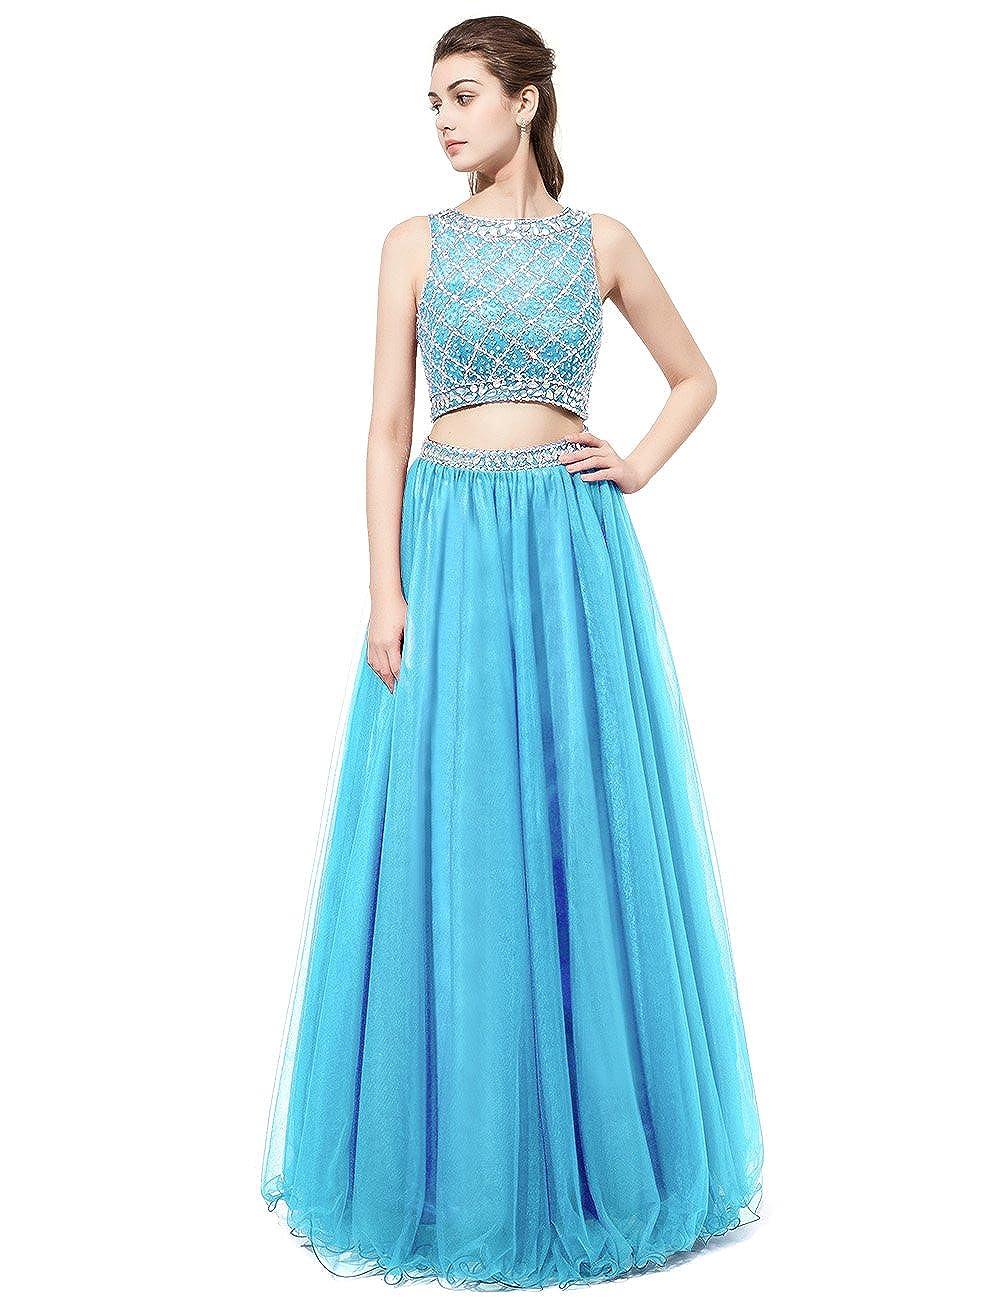 Body Fitting Prom Dresses